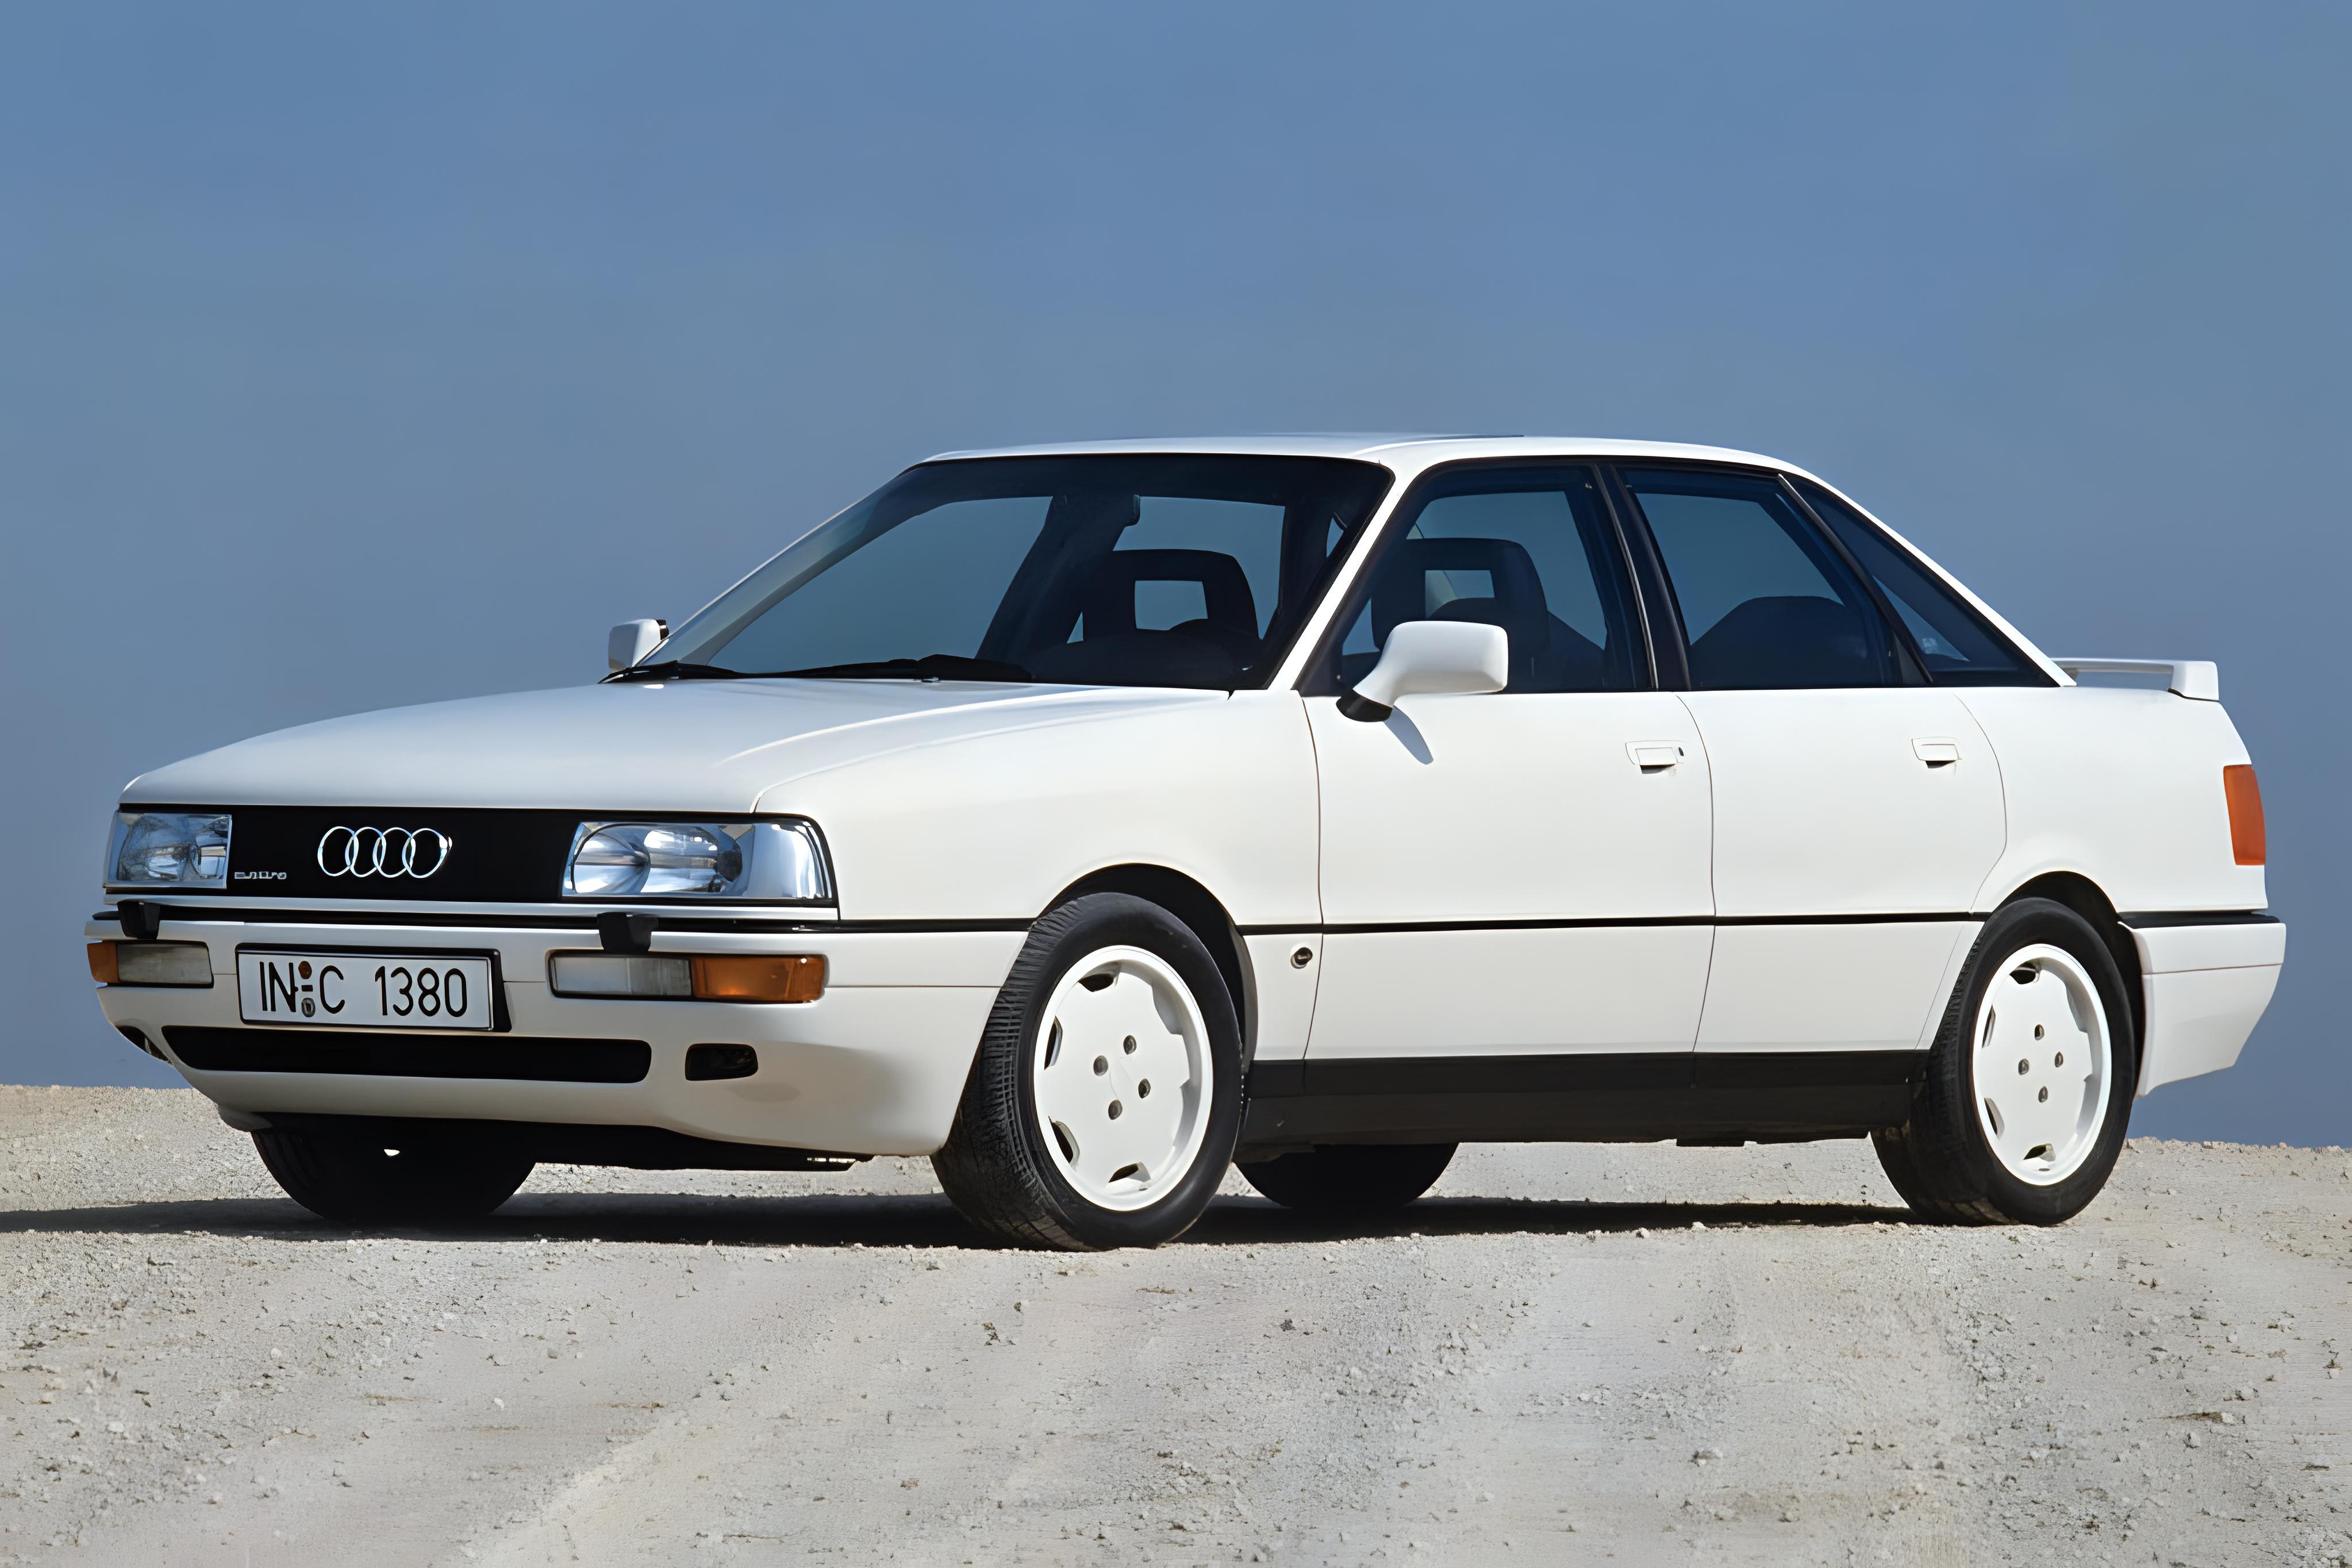 Audi 90 history, photos on Better Parts LTD